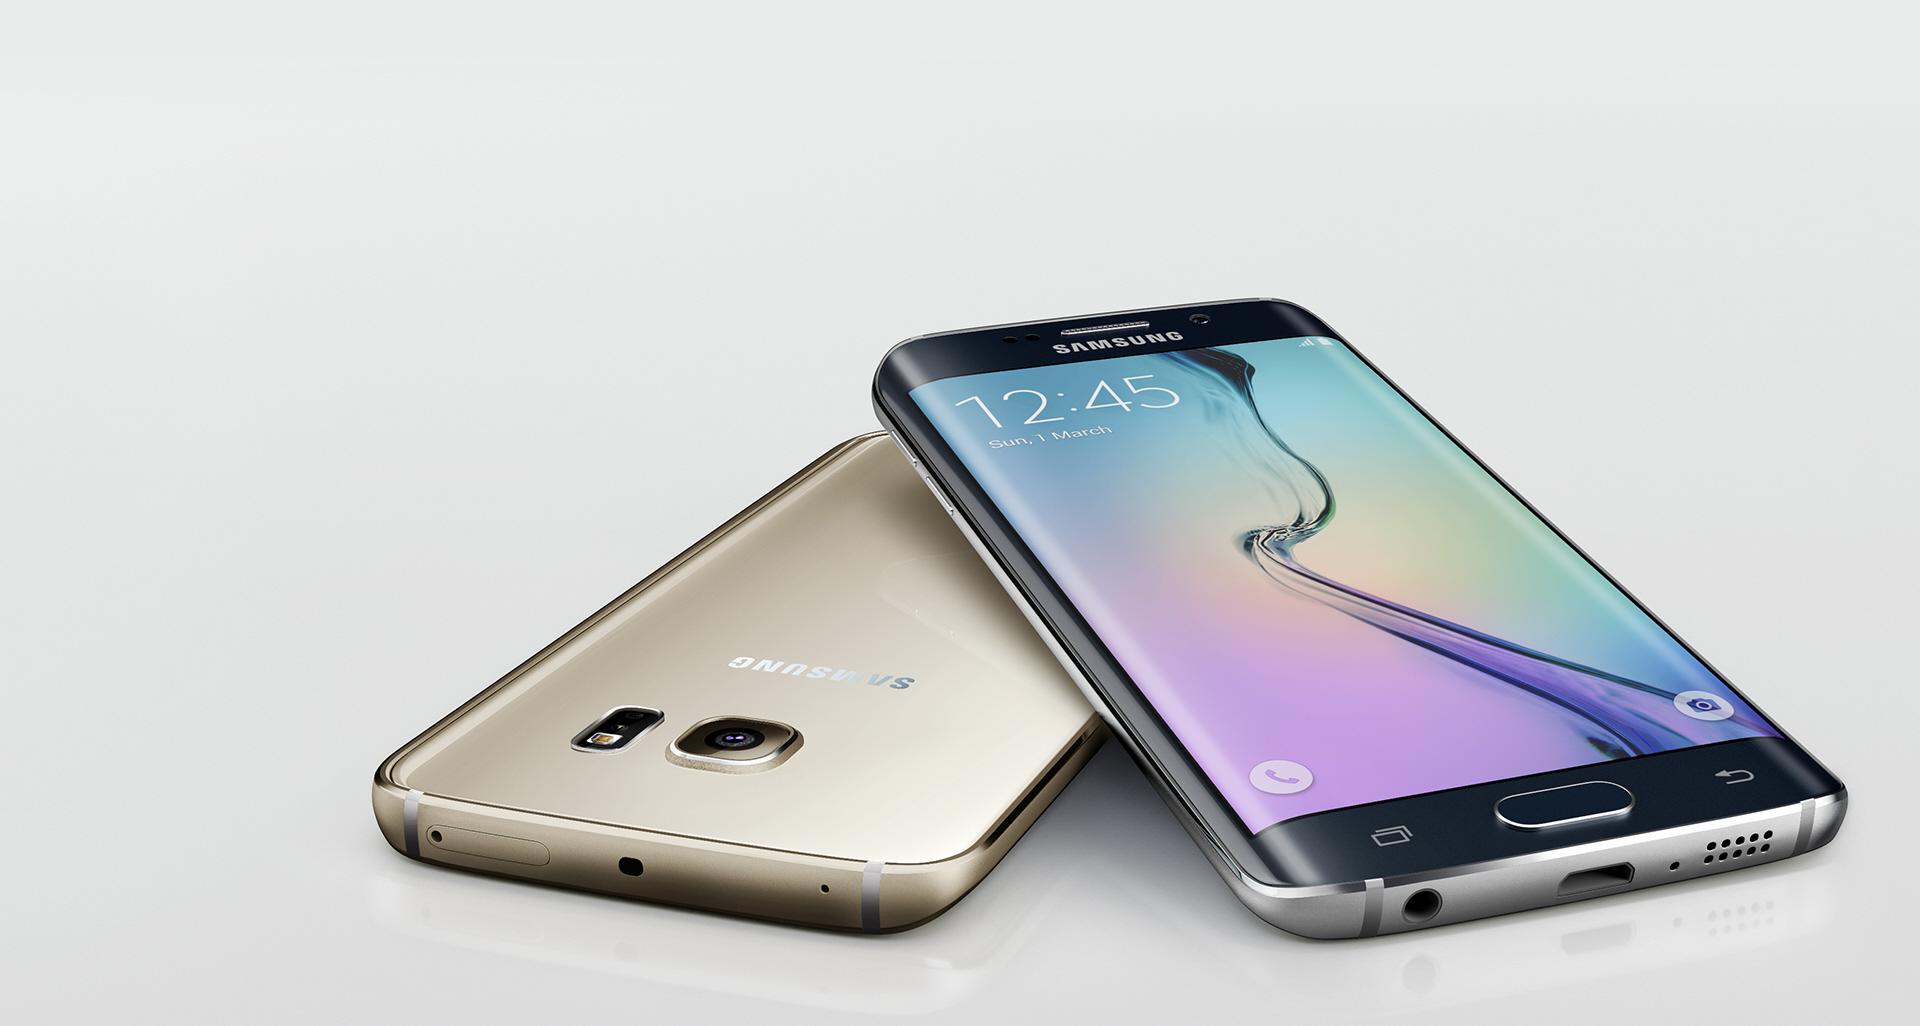 LG G4 versus Samsung Galaxy S6 10